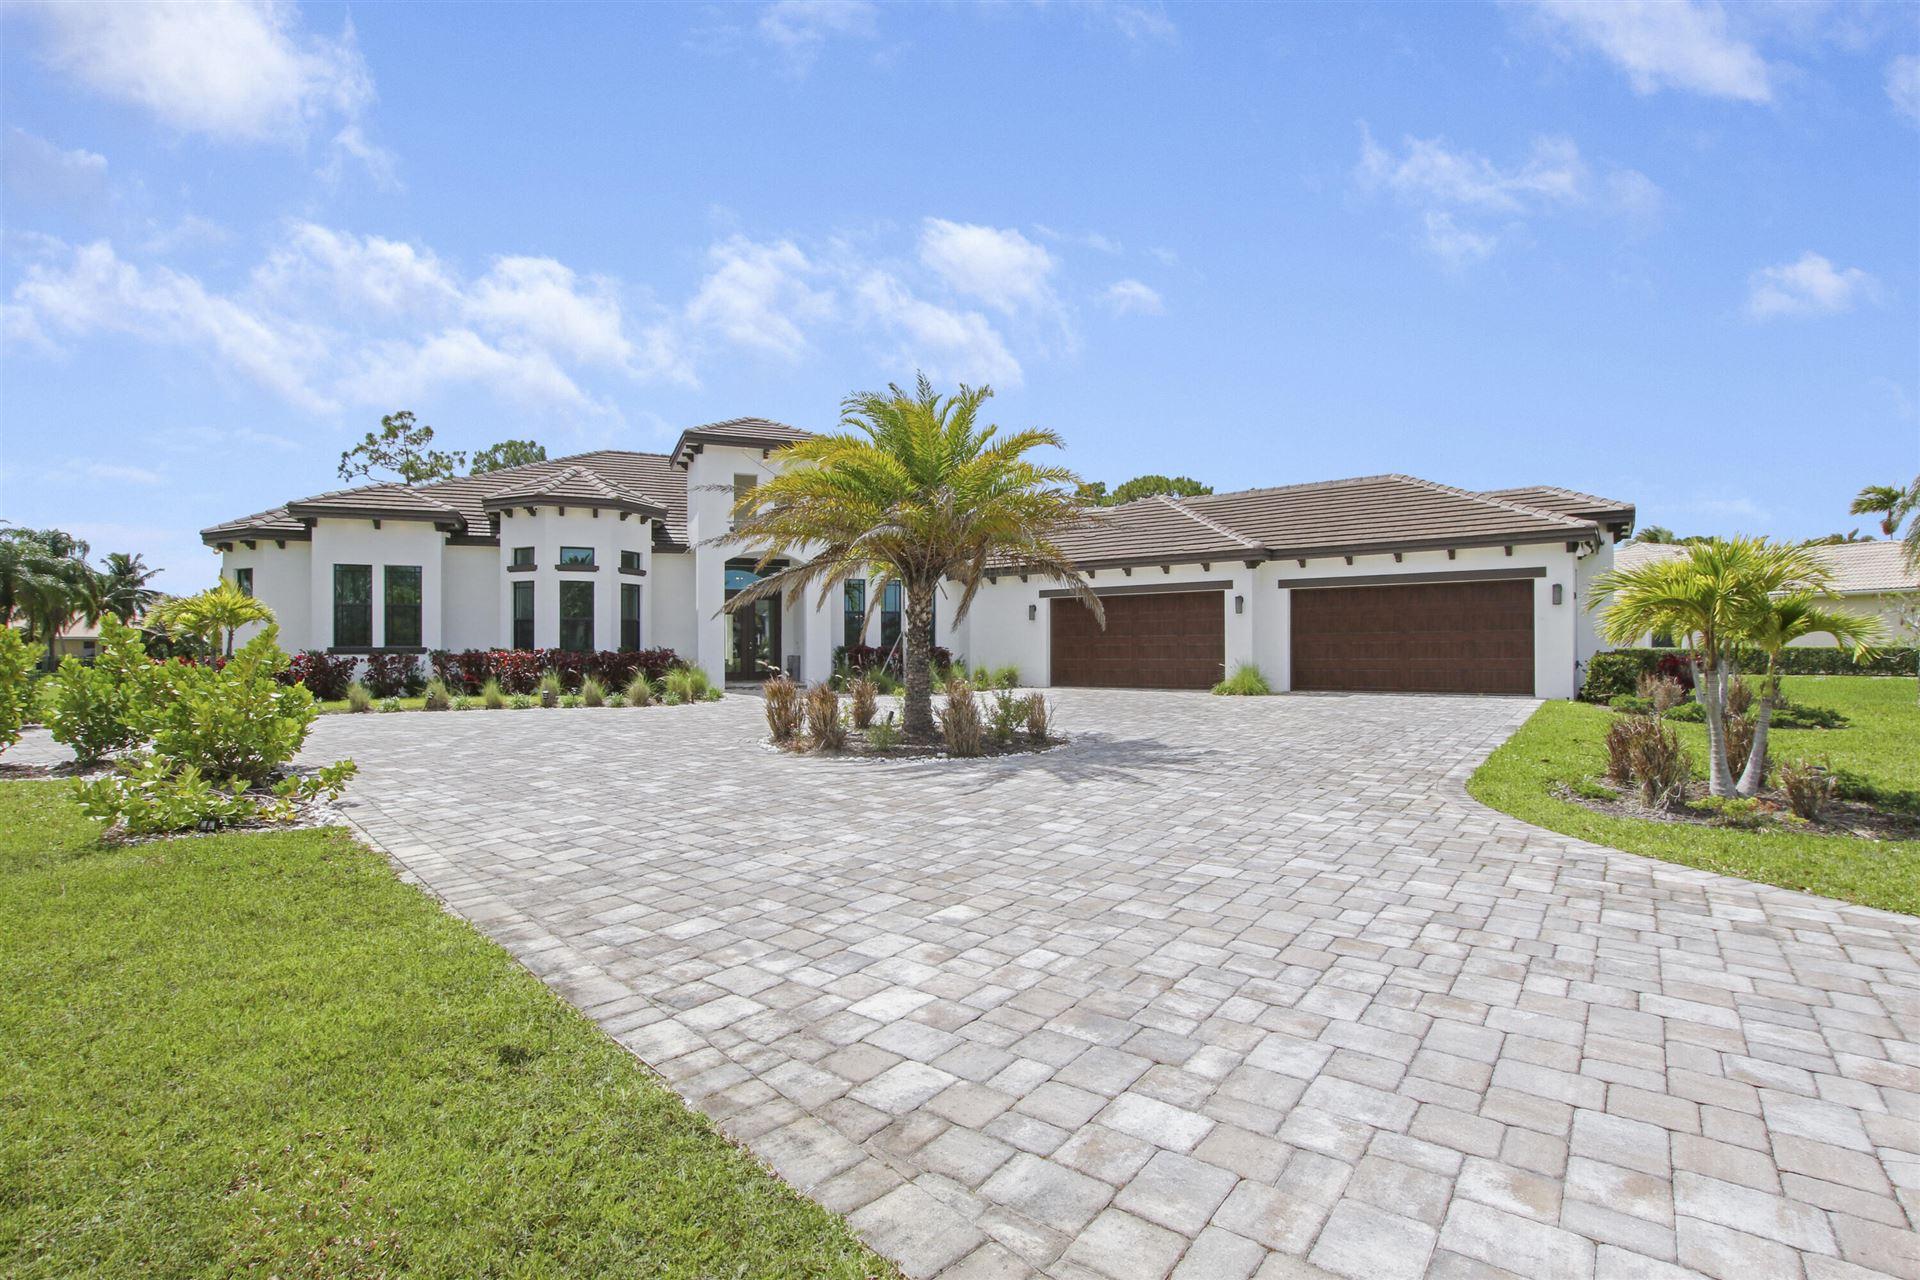 7831 E Woodsmuir Drive, Palm Beach Gardens, FL 33412 - MLS#: RX-10711948